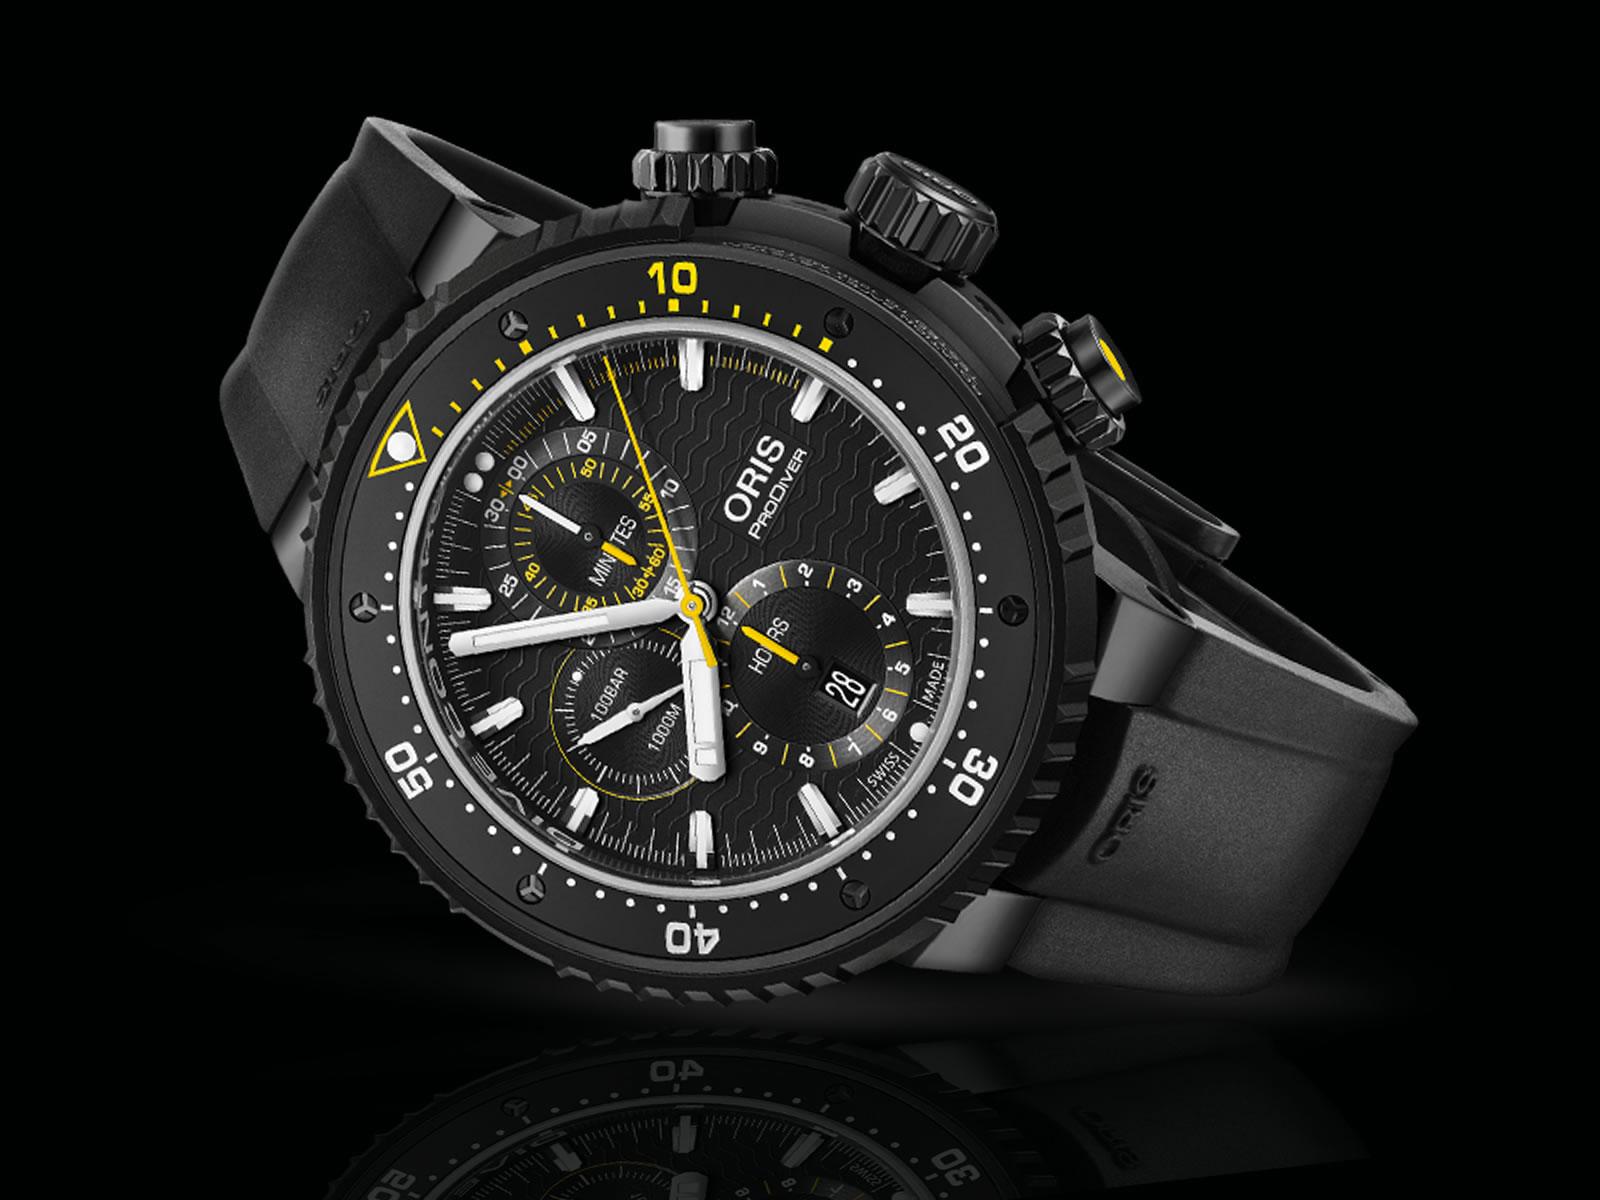 01-774-7727-7784-set-oris-prodiver-dive-control-chronograph-1-.jpg